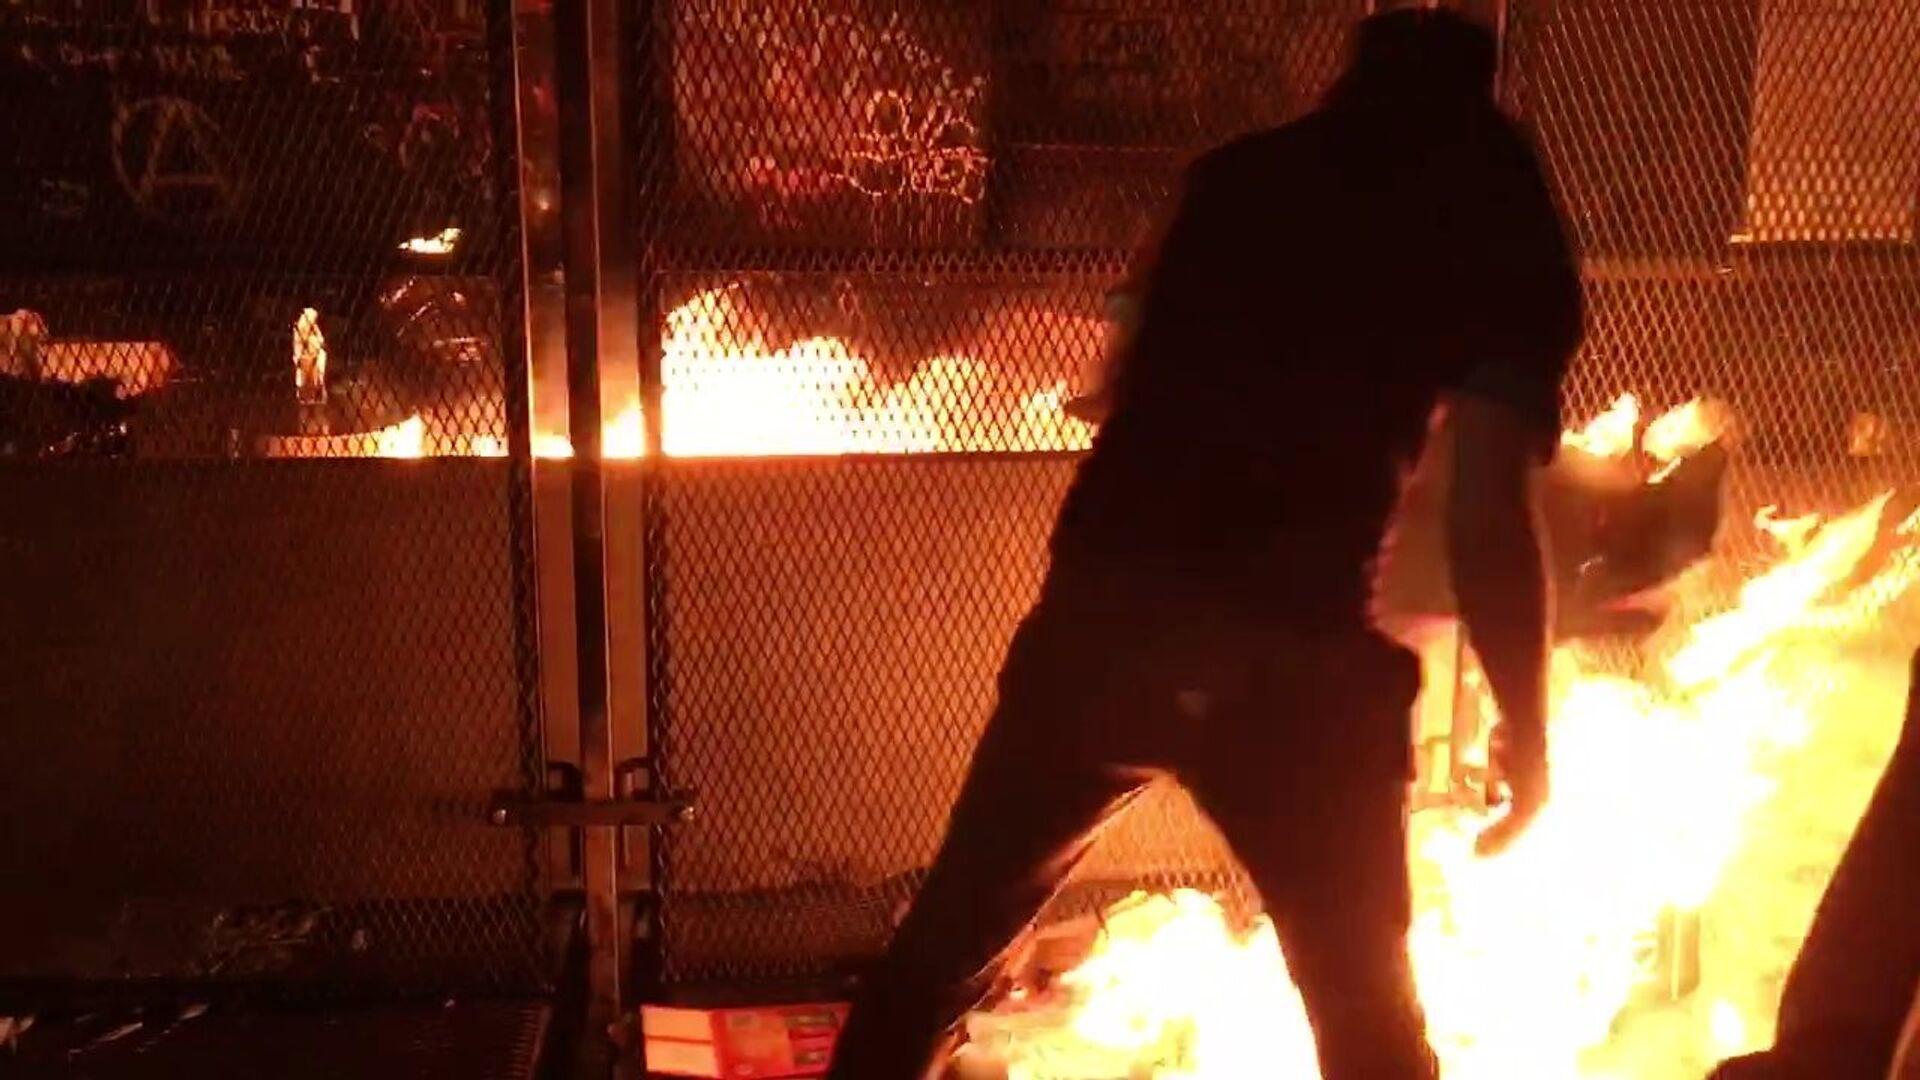 Protesters burn trash near the federal courthouse in Portland on 23 July 2020 - Sputnik International, 1920, 07.09.2021